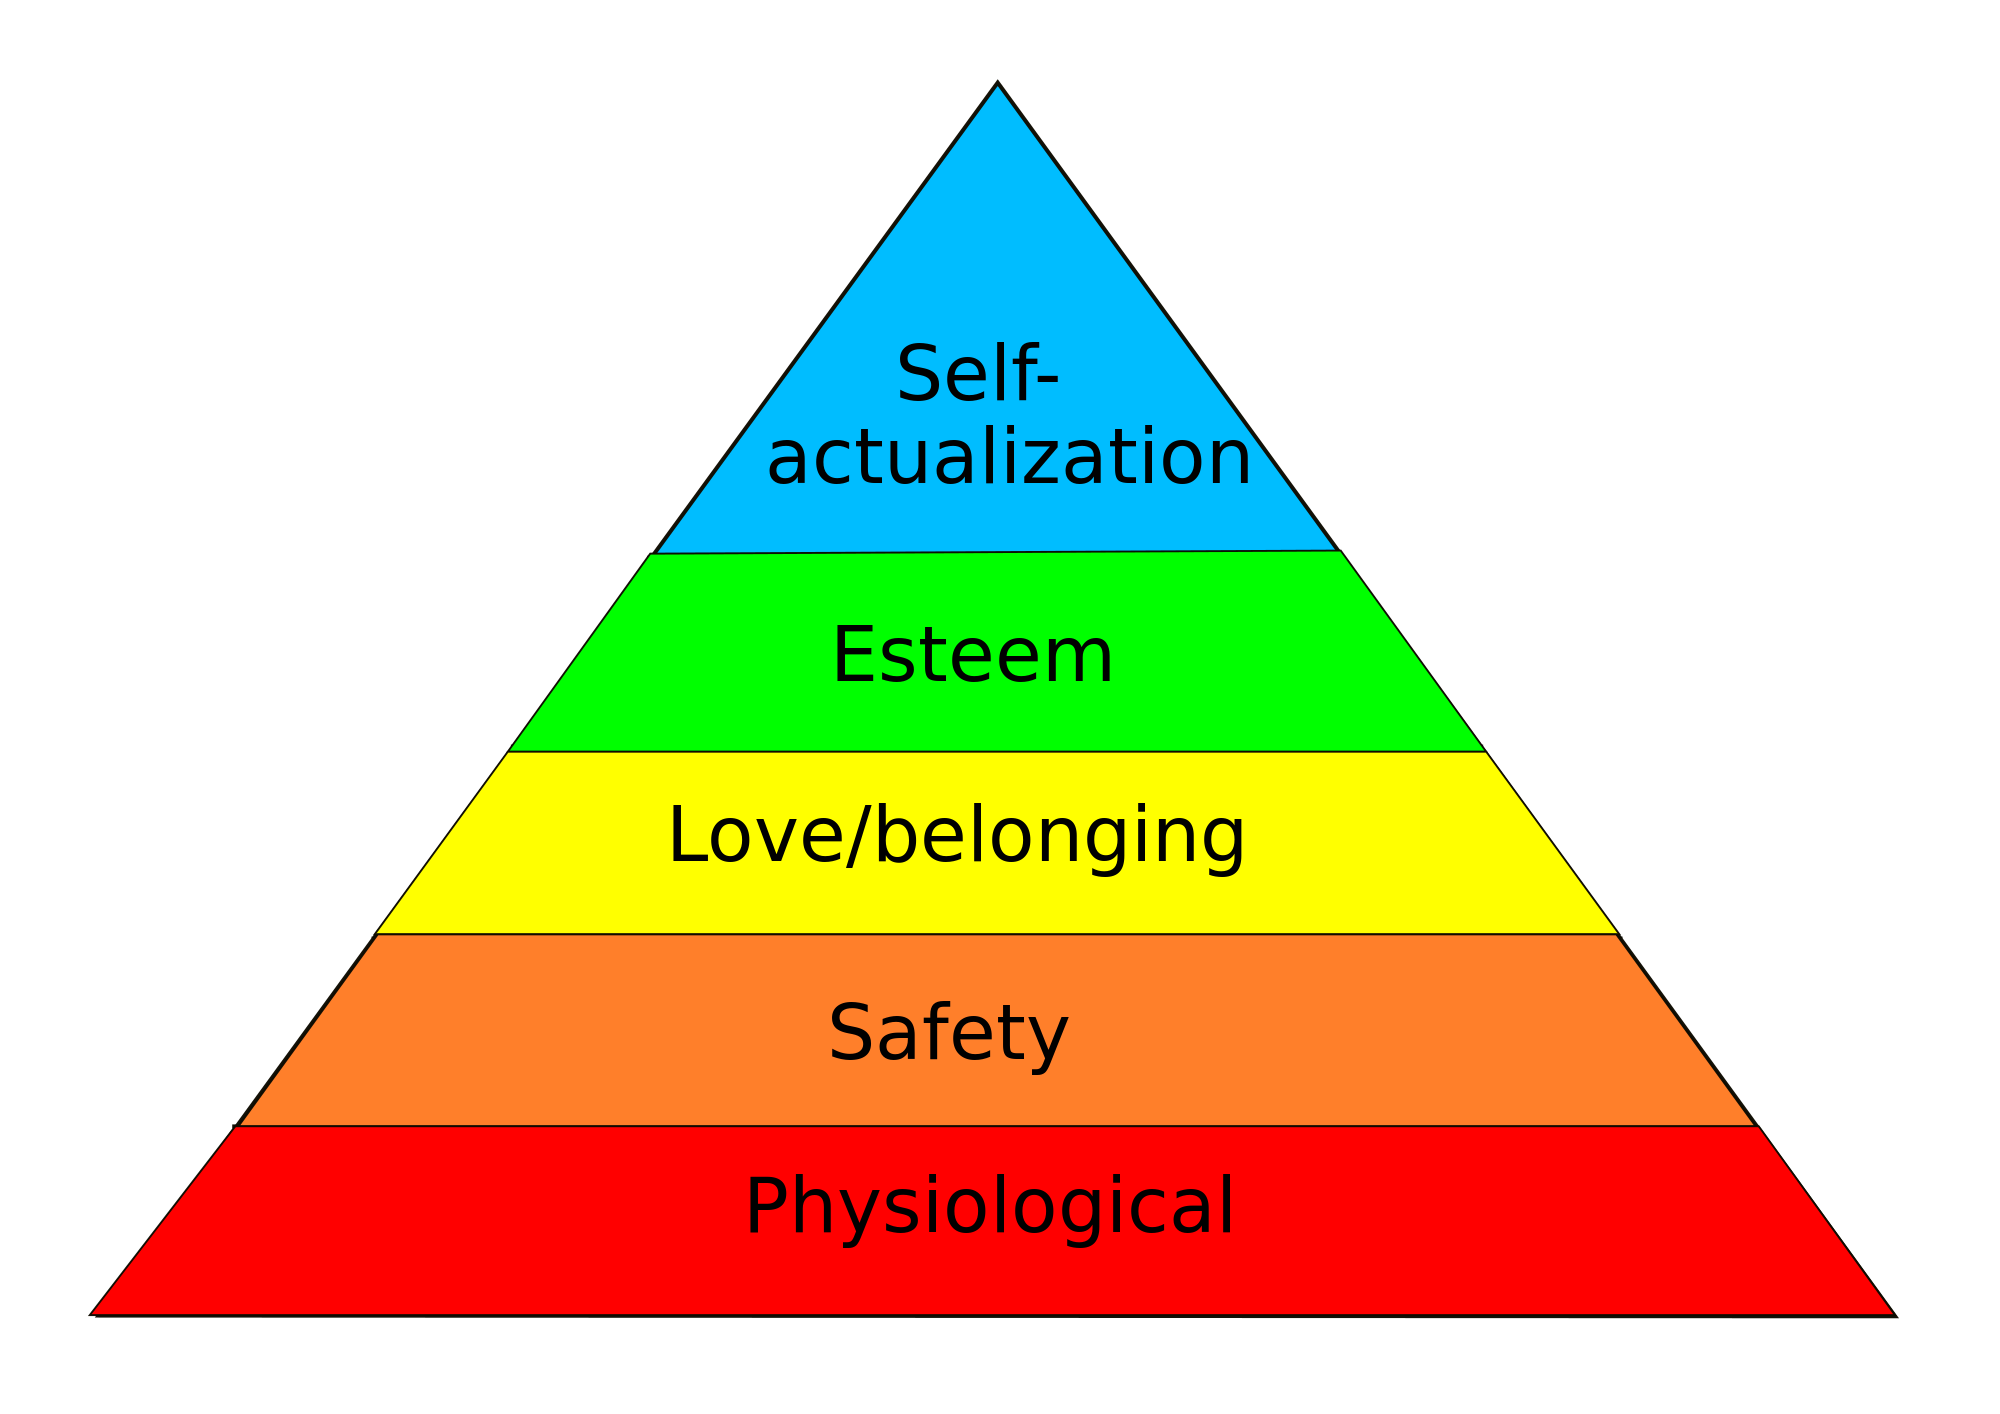 Maslowspyramid